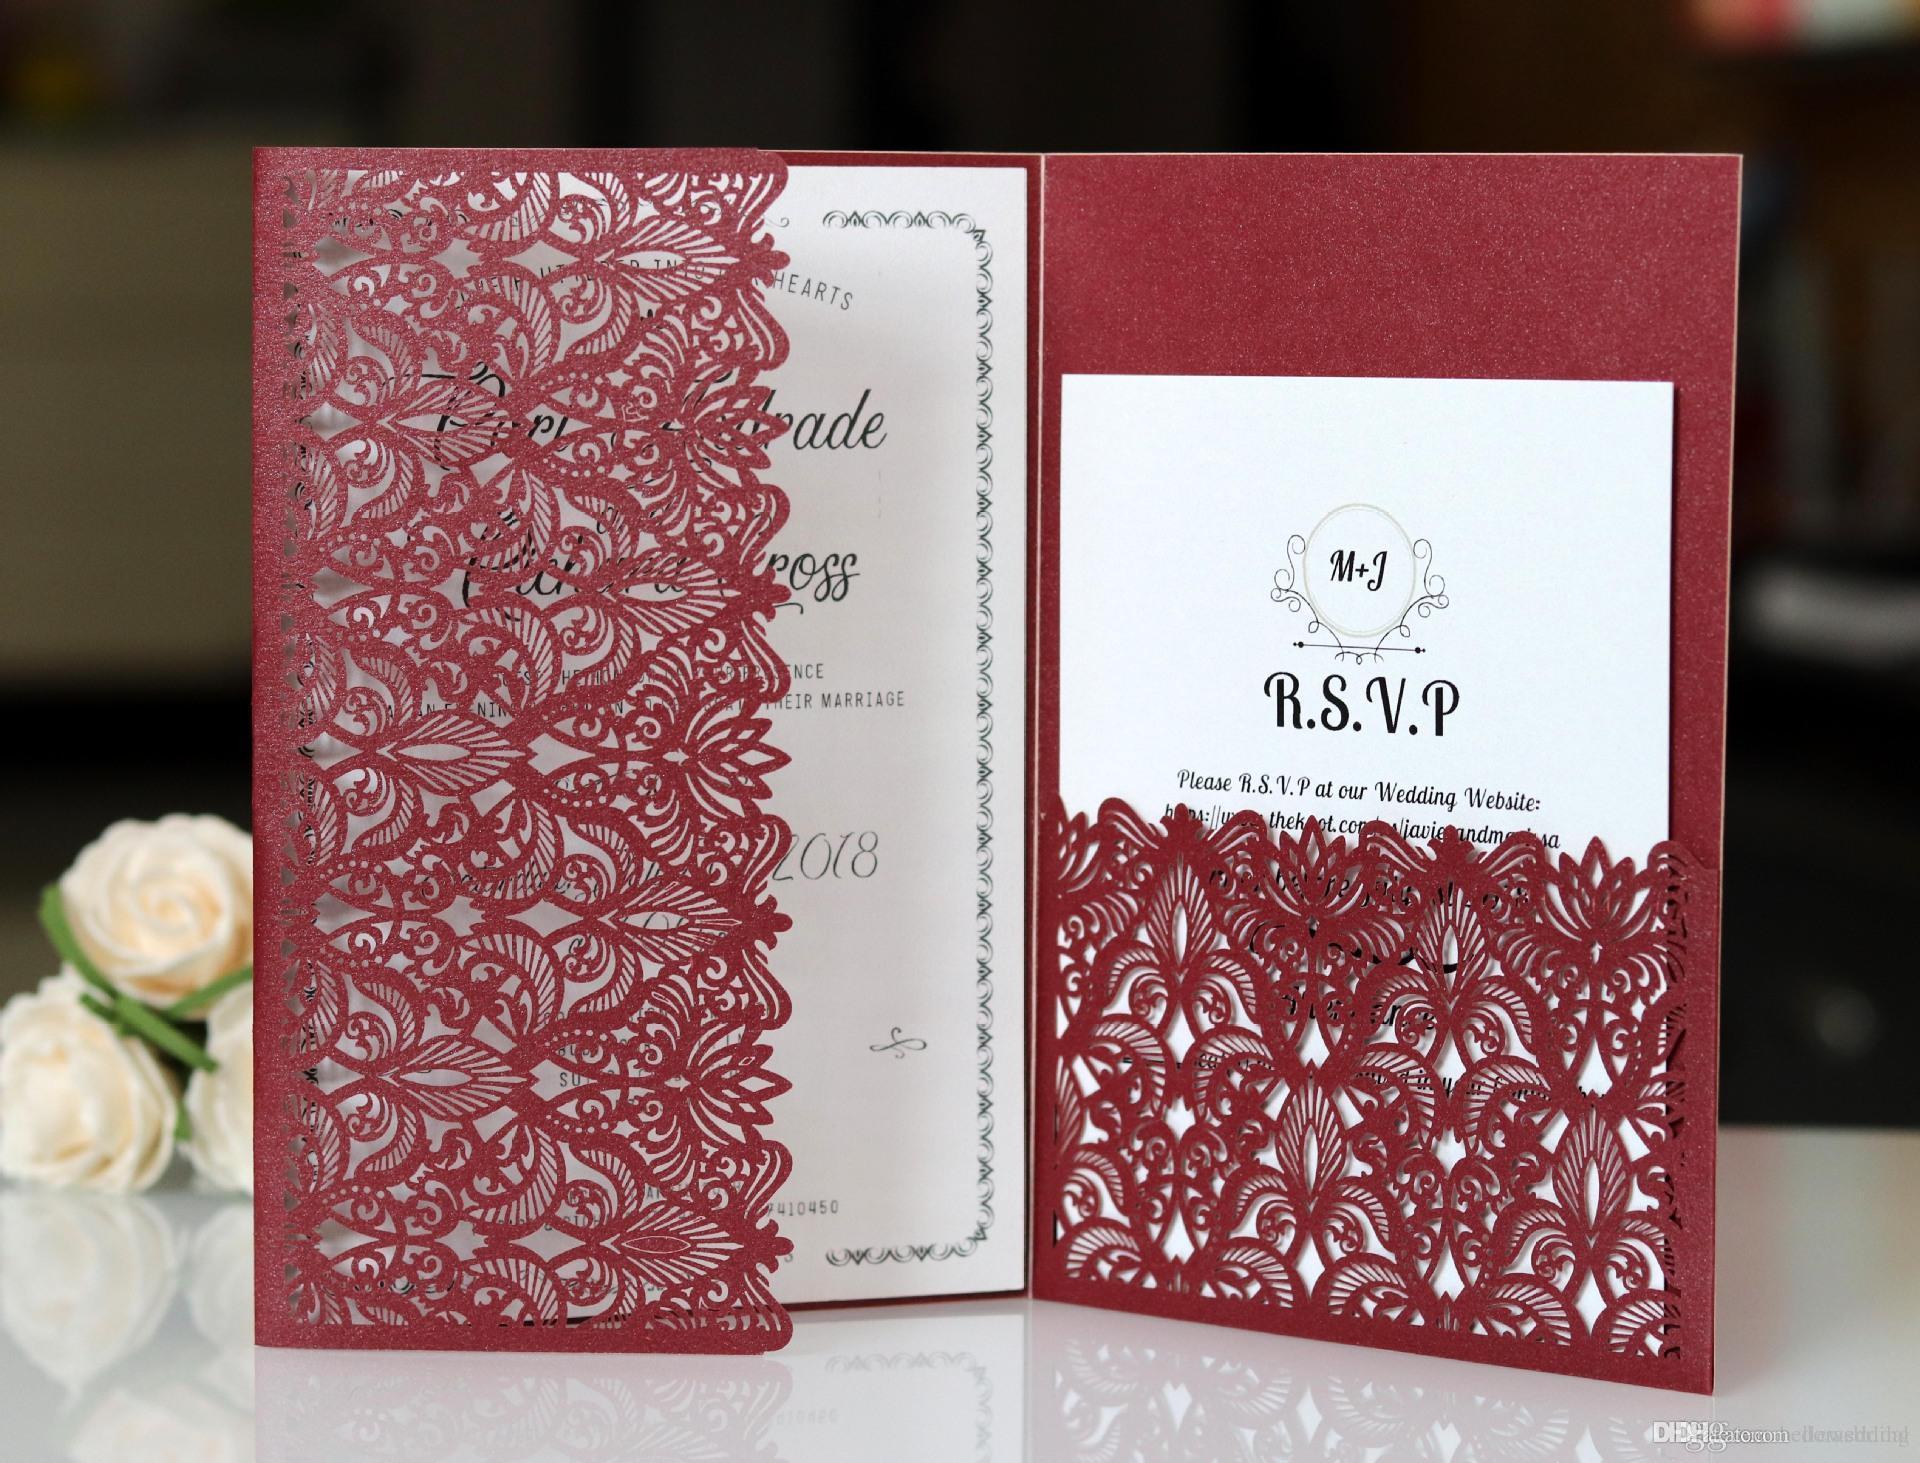 4b1726dba3 Laser Cut Wedding Invitations With RSVP Cards Burgundy Customized Flowers  Folded Wedding Invitation Cards With Envelopes BW-HK153